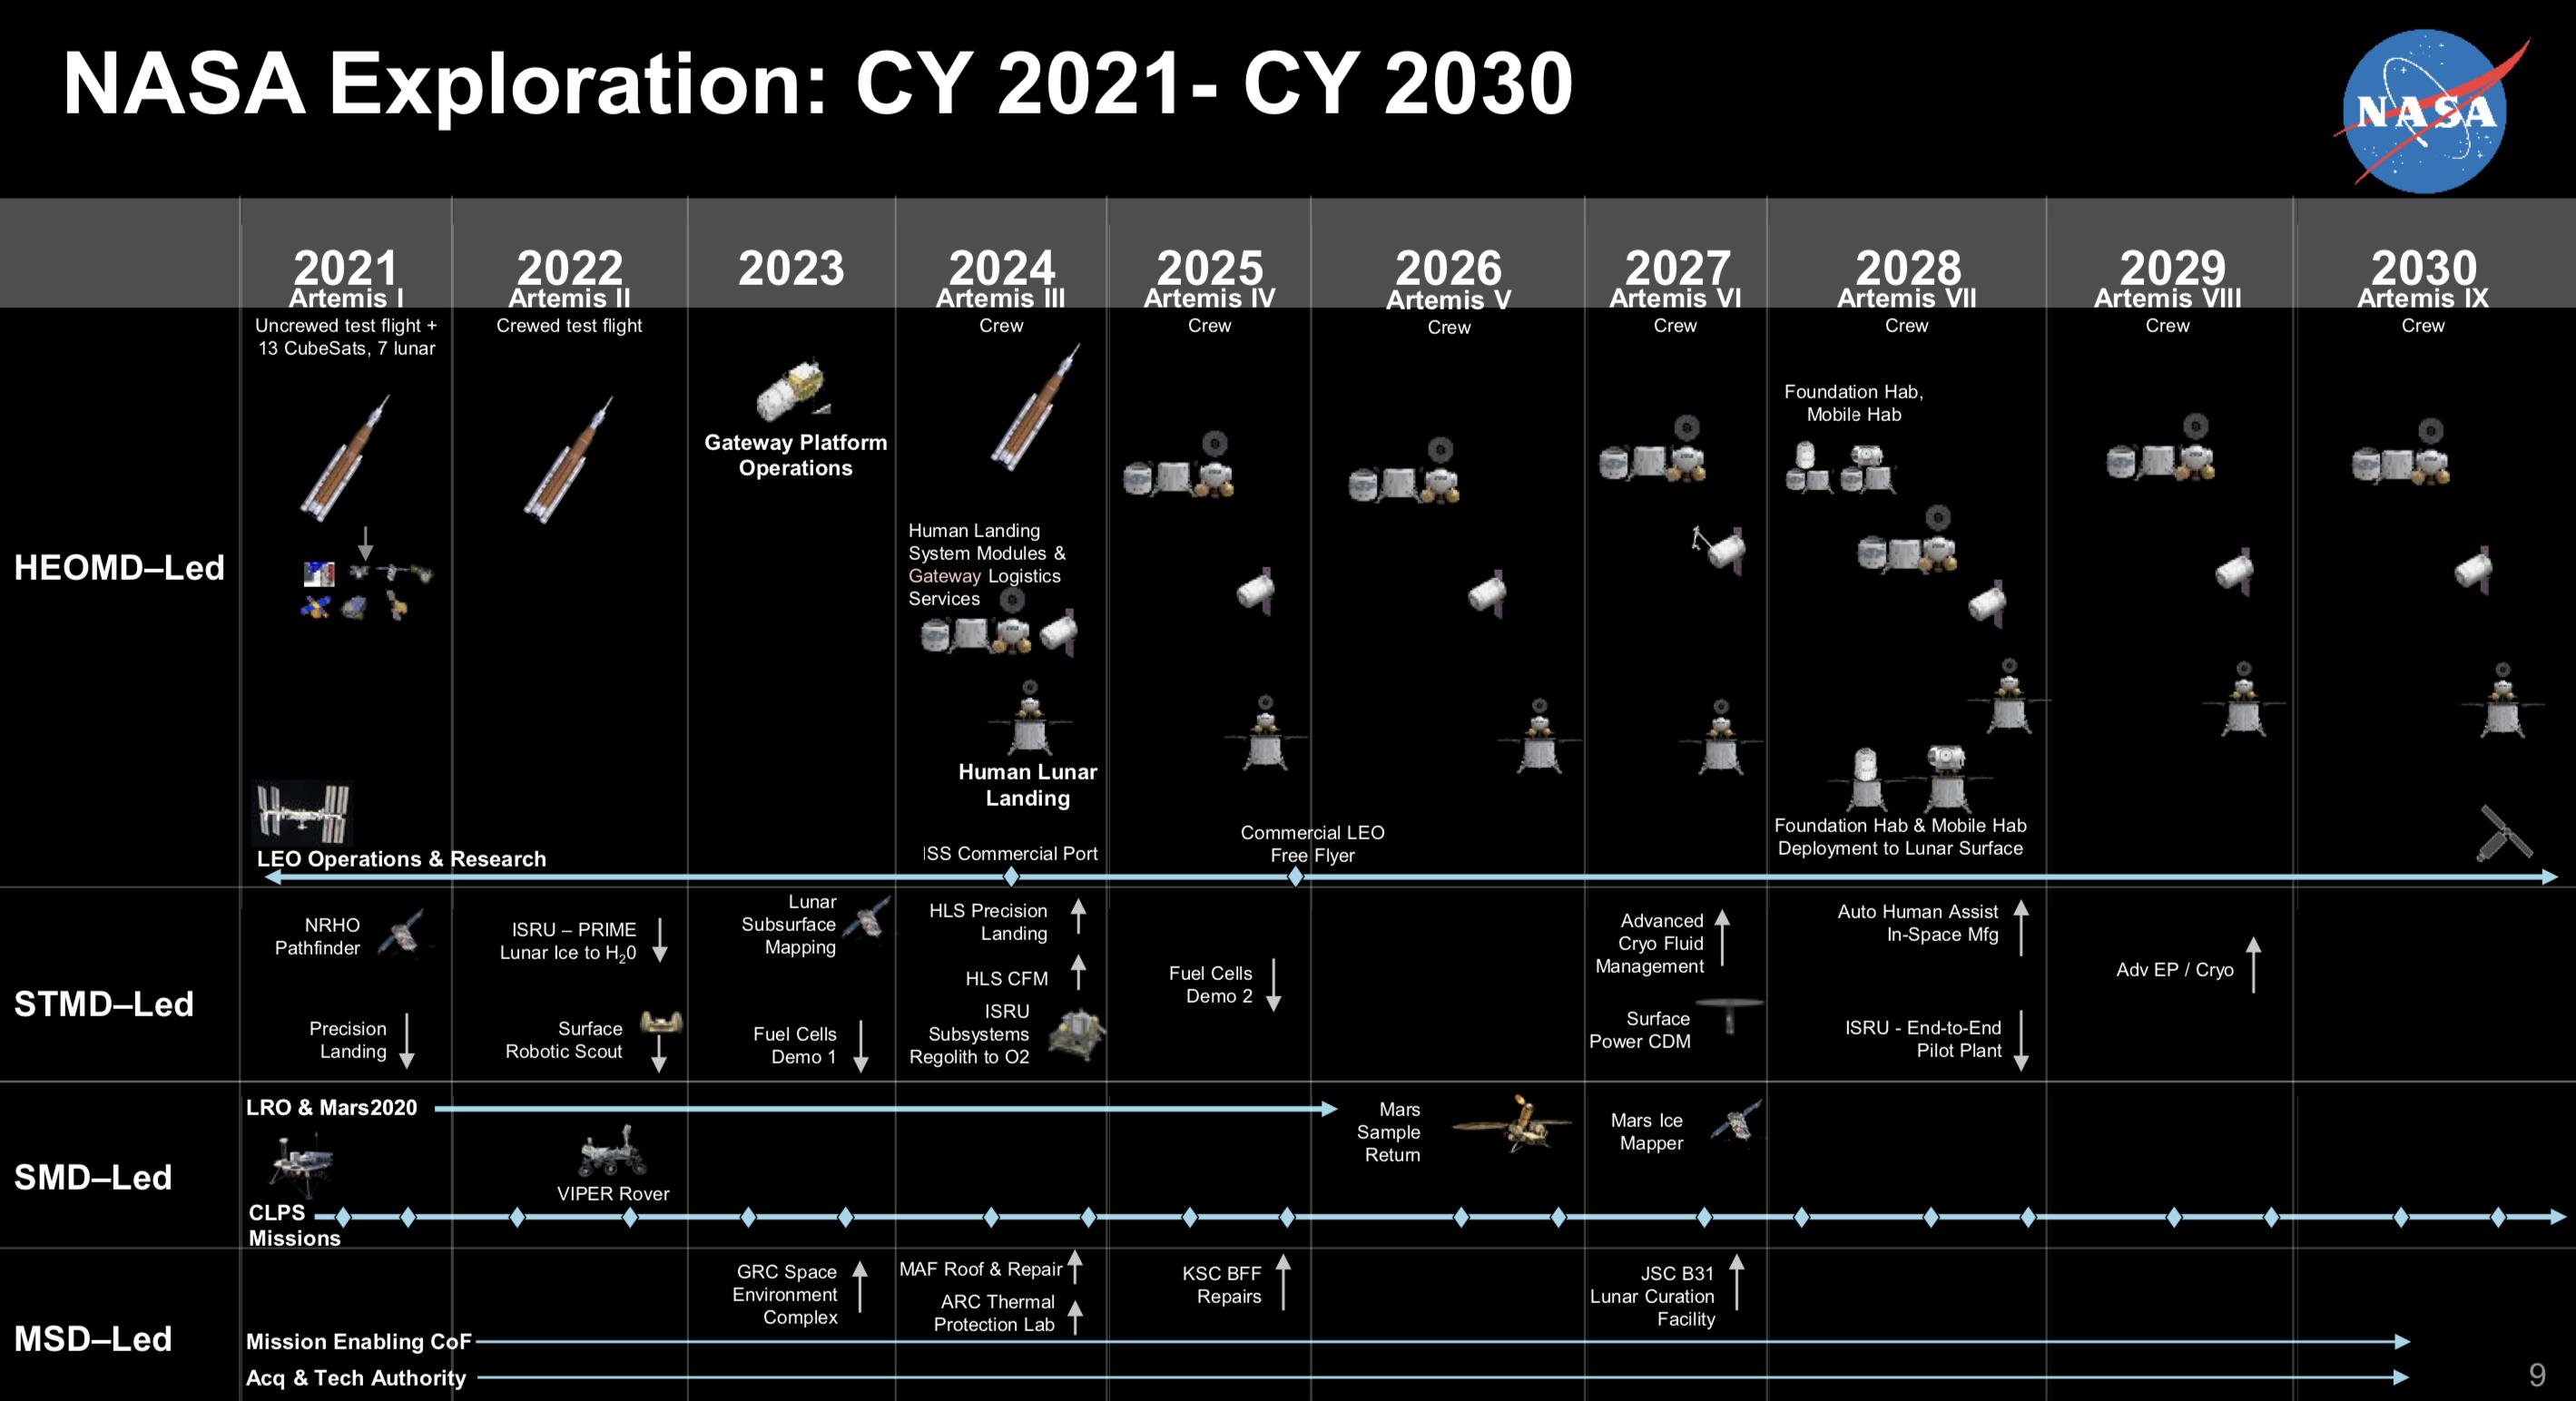 NASA lunar gateway launch construction timeframe